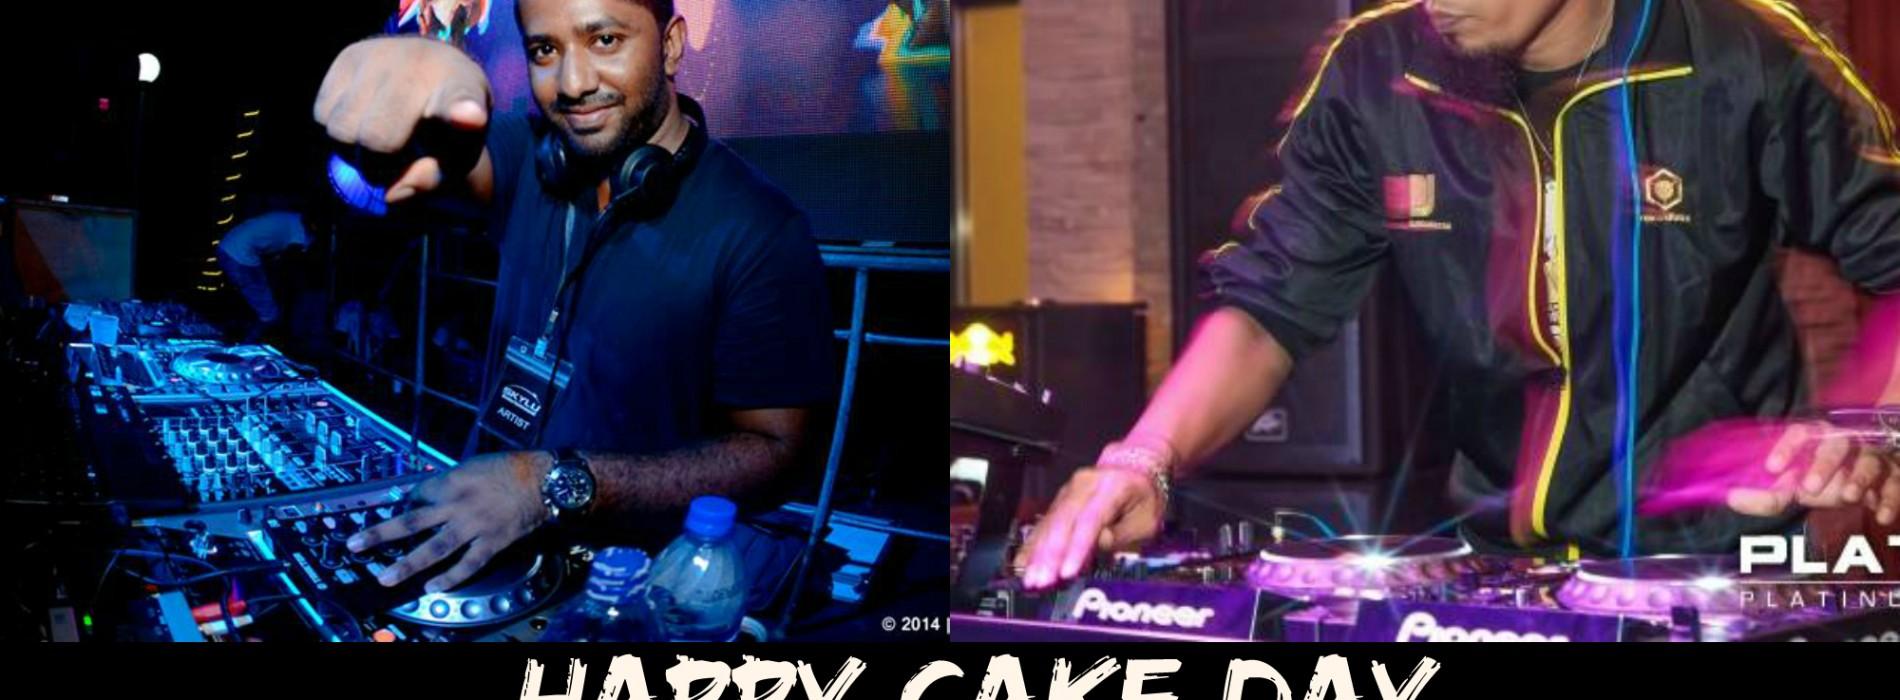 Happy Cake Day Feb 14th Names